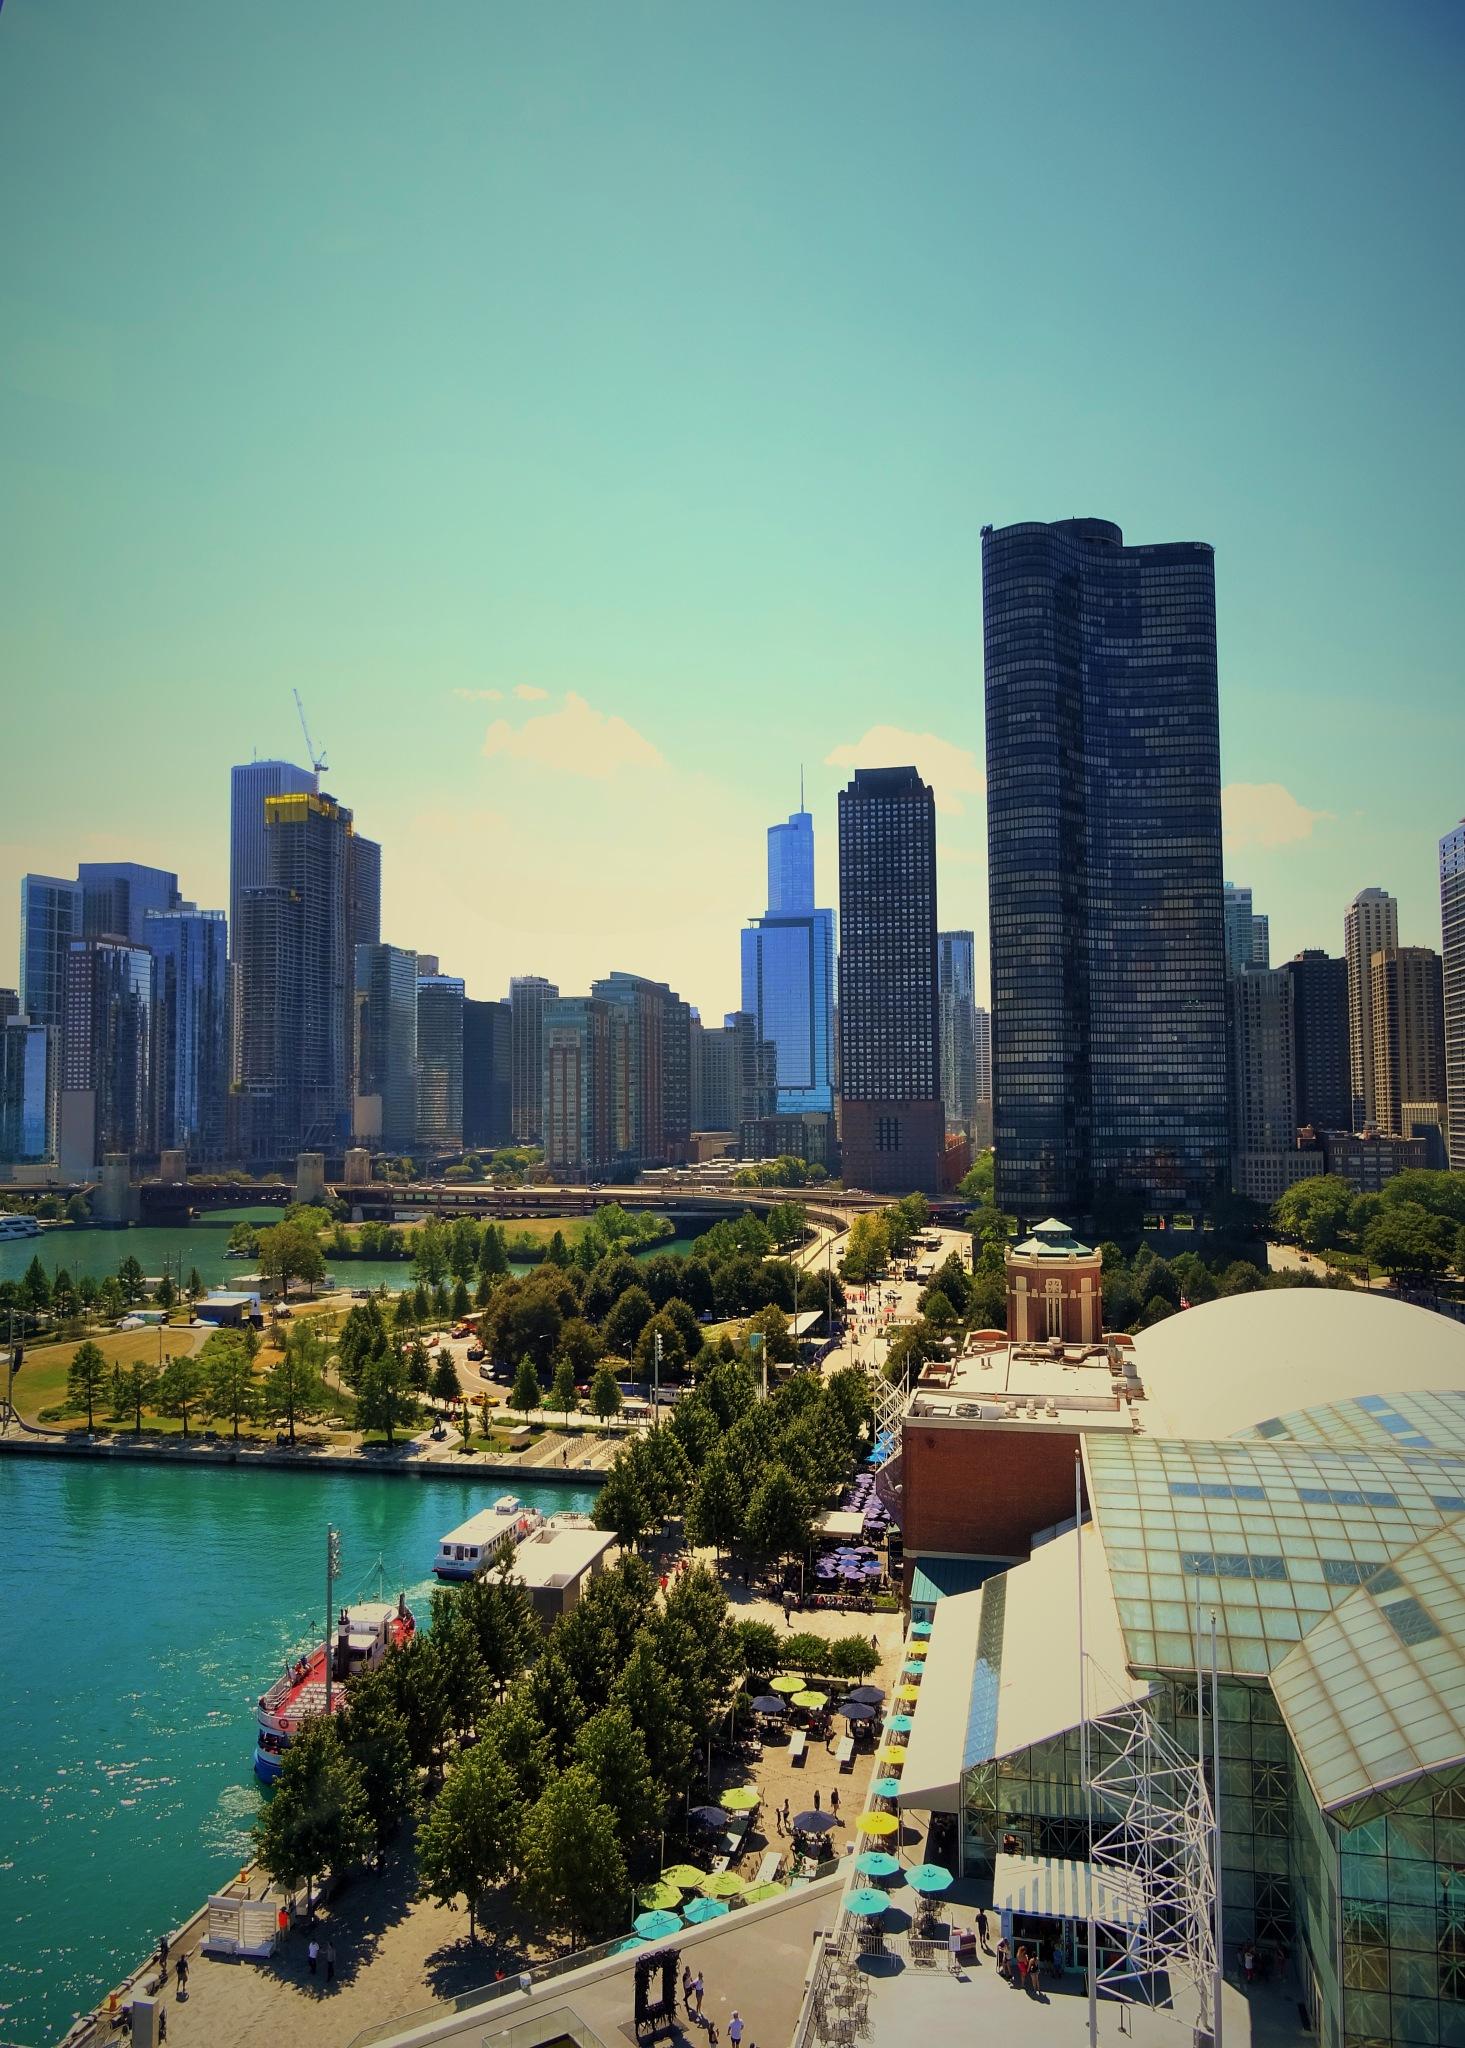 Chicago. by vita.tucaite